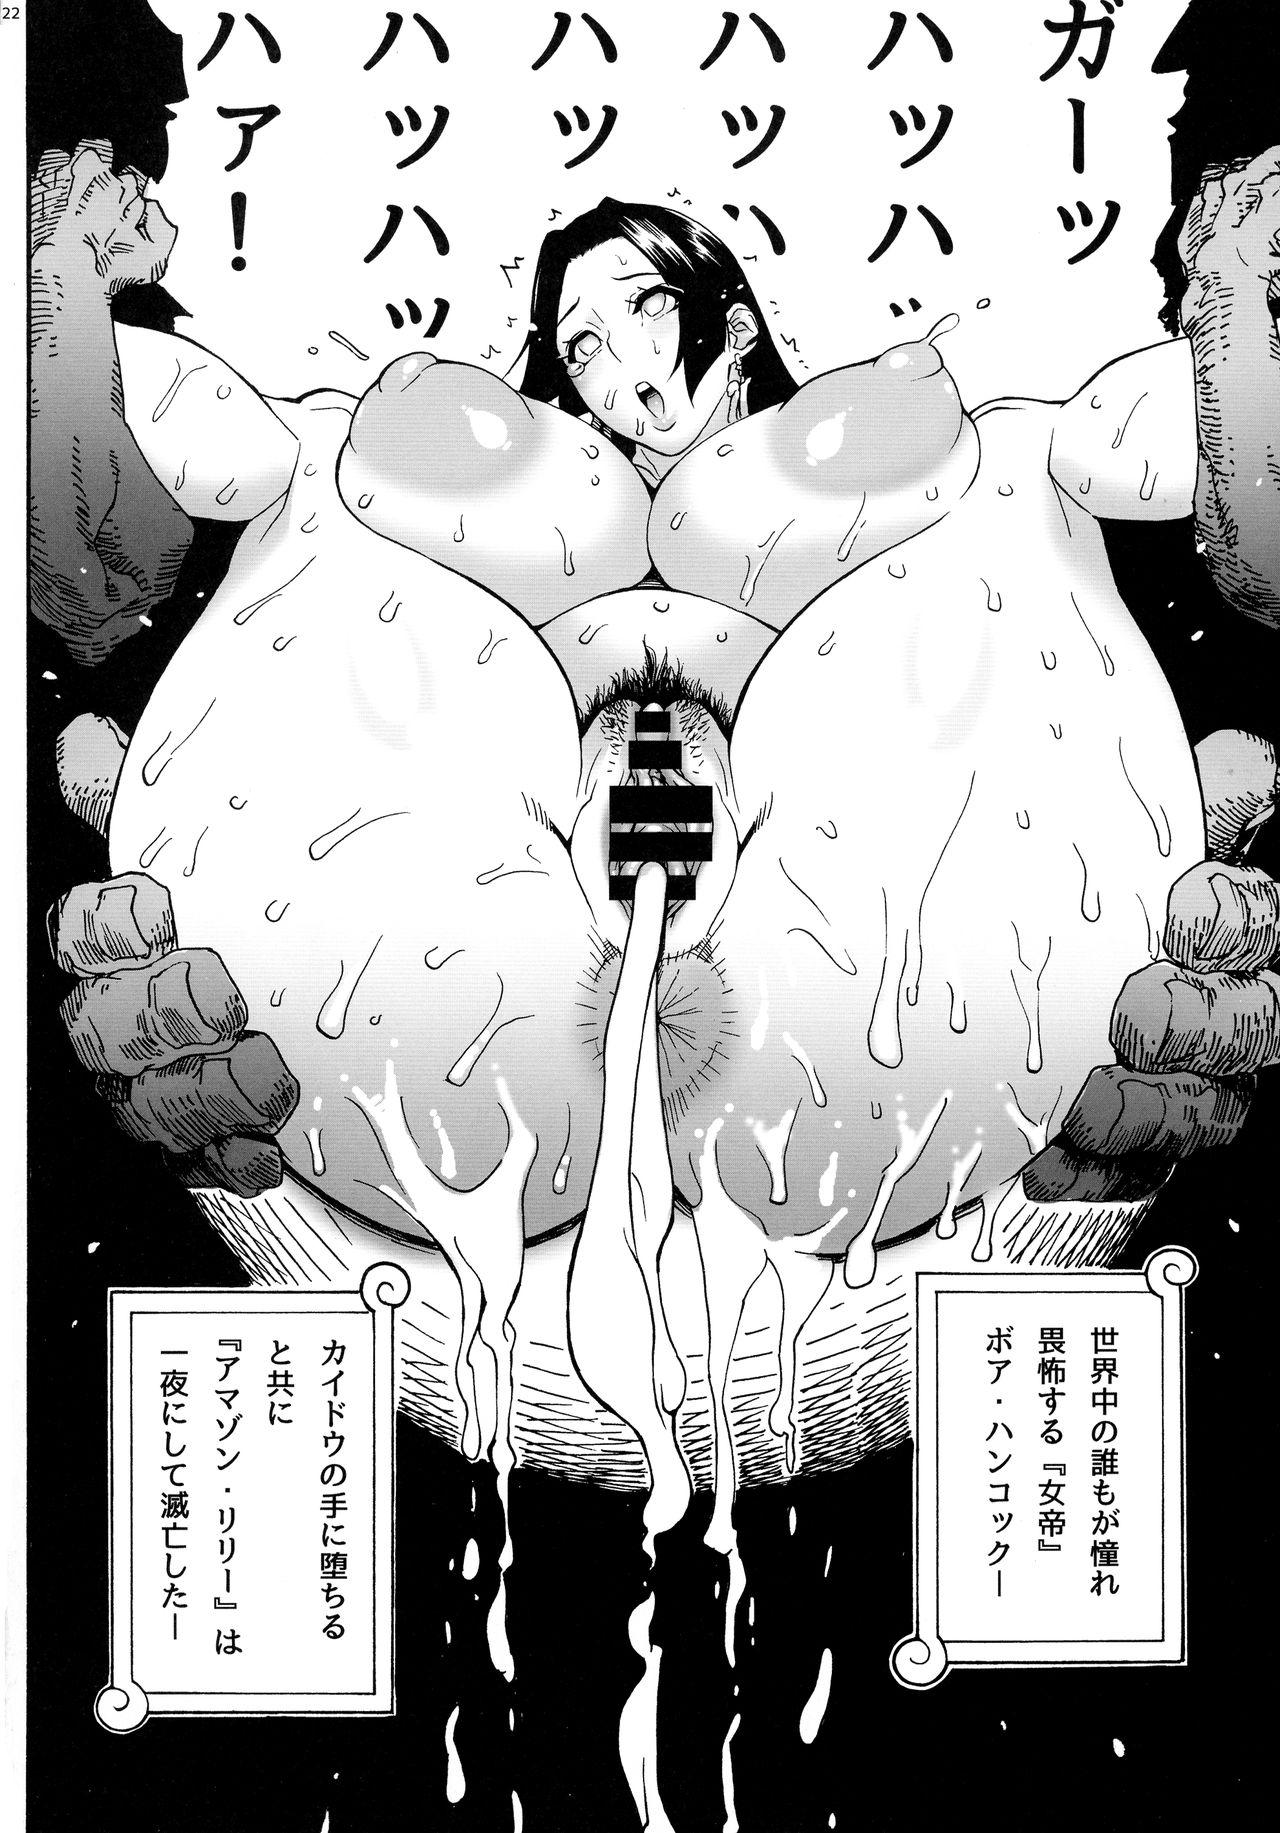 One piece amazon lily hentai